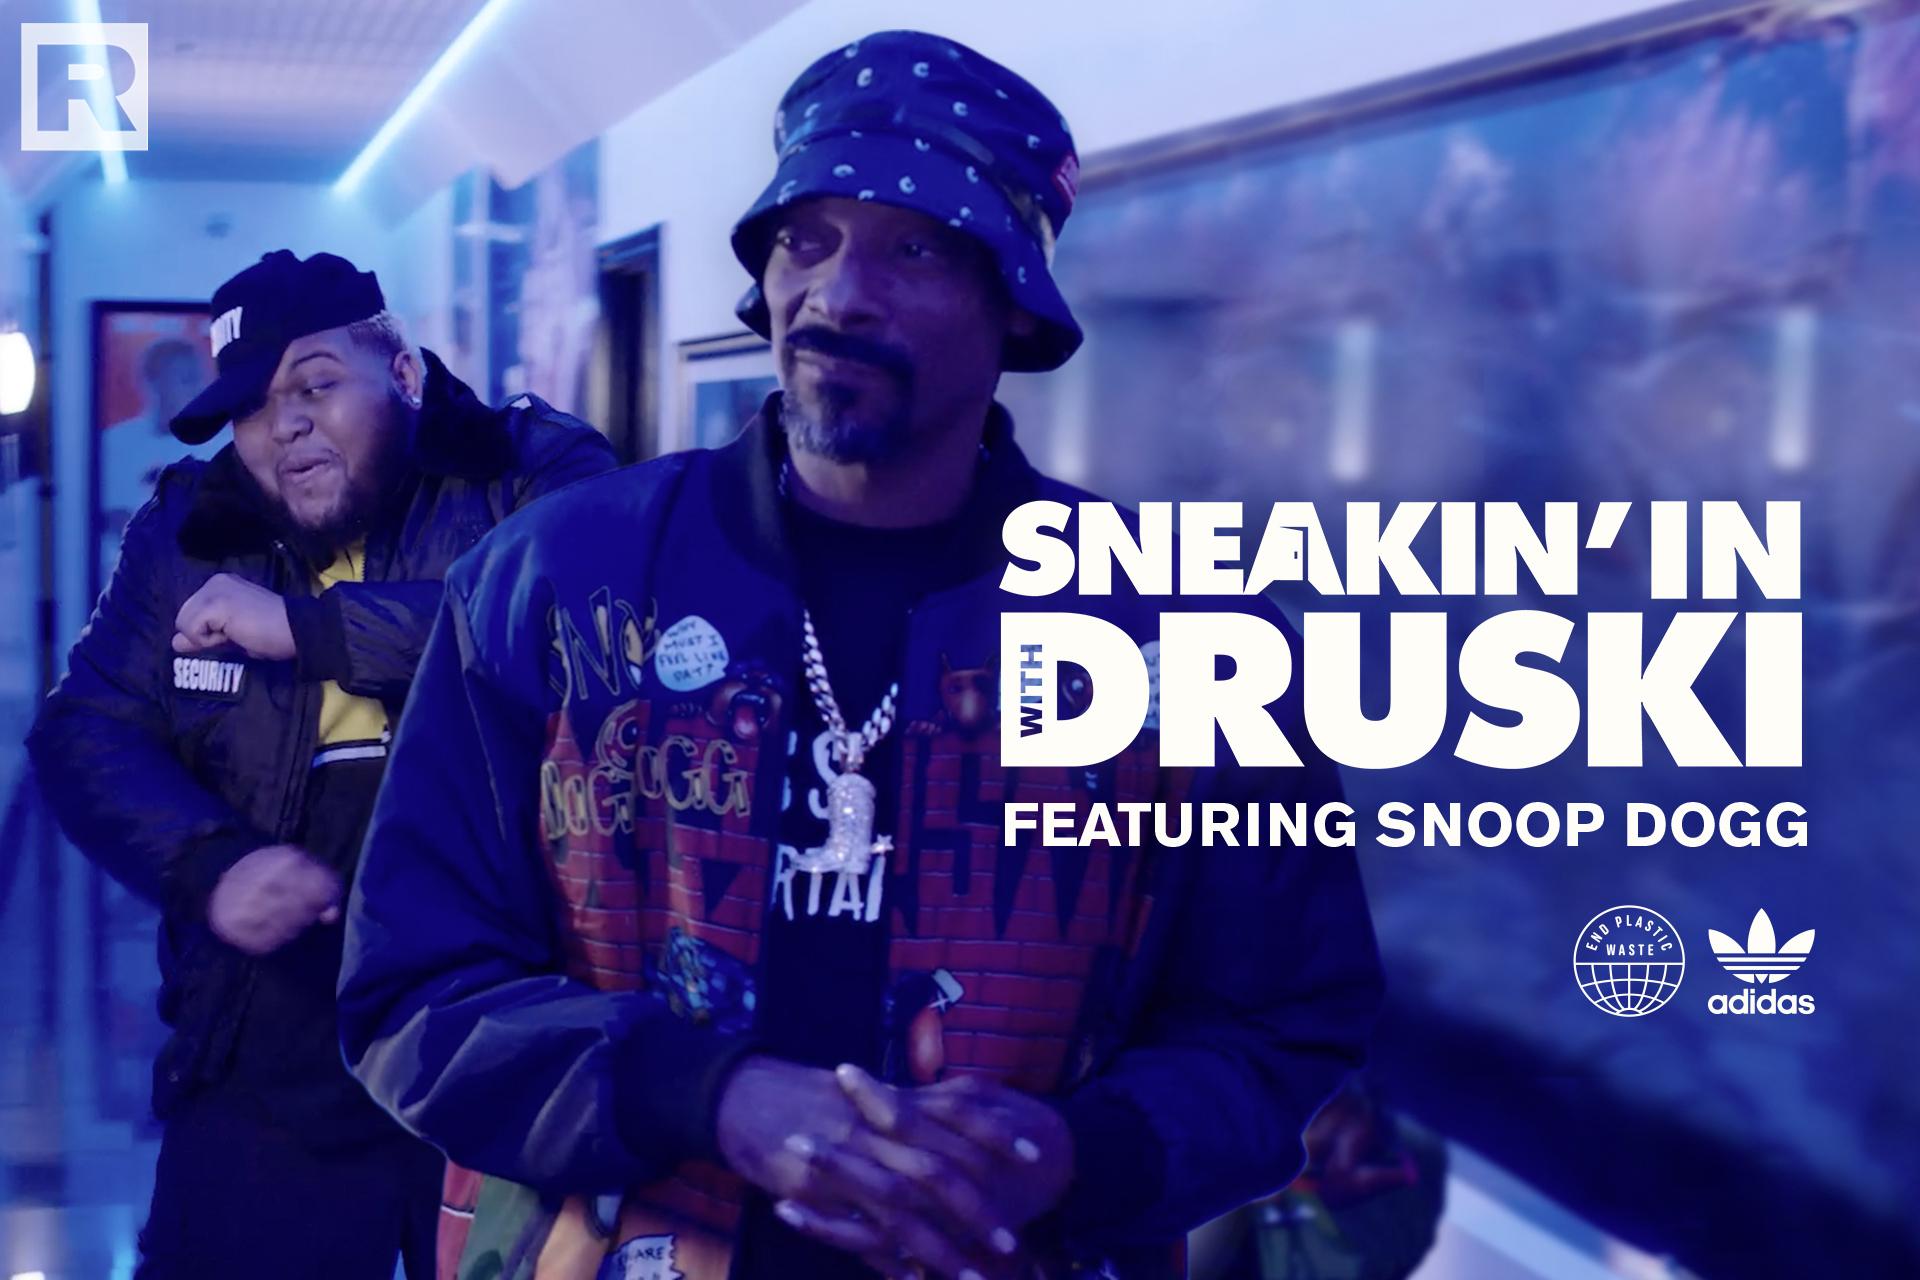 Snoop Dogg and Druski